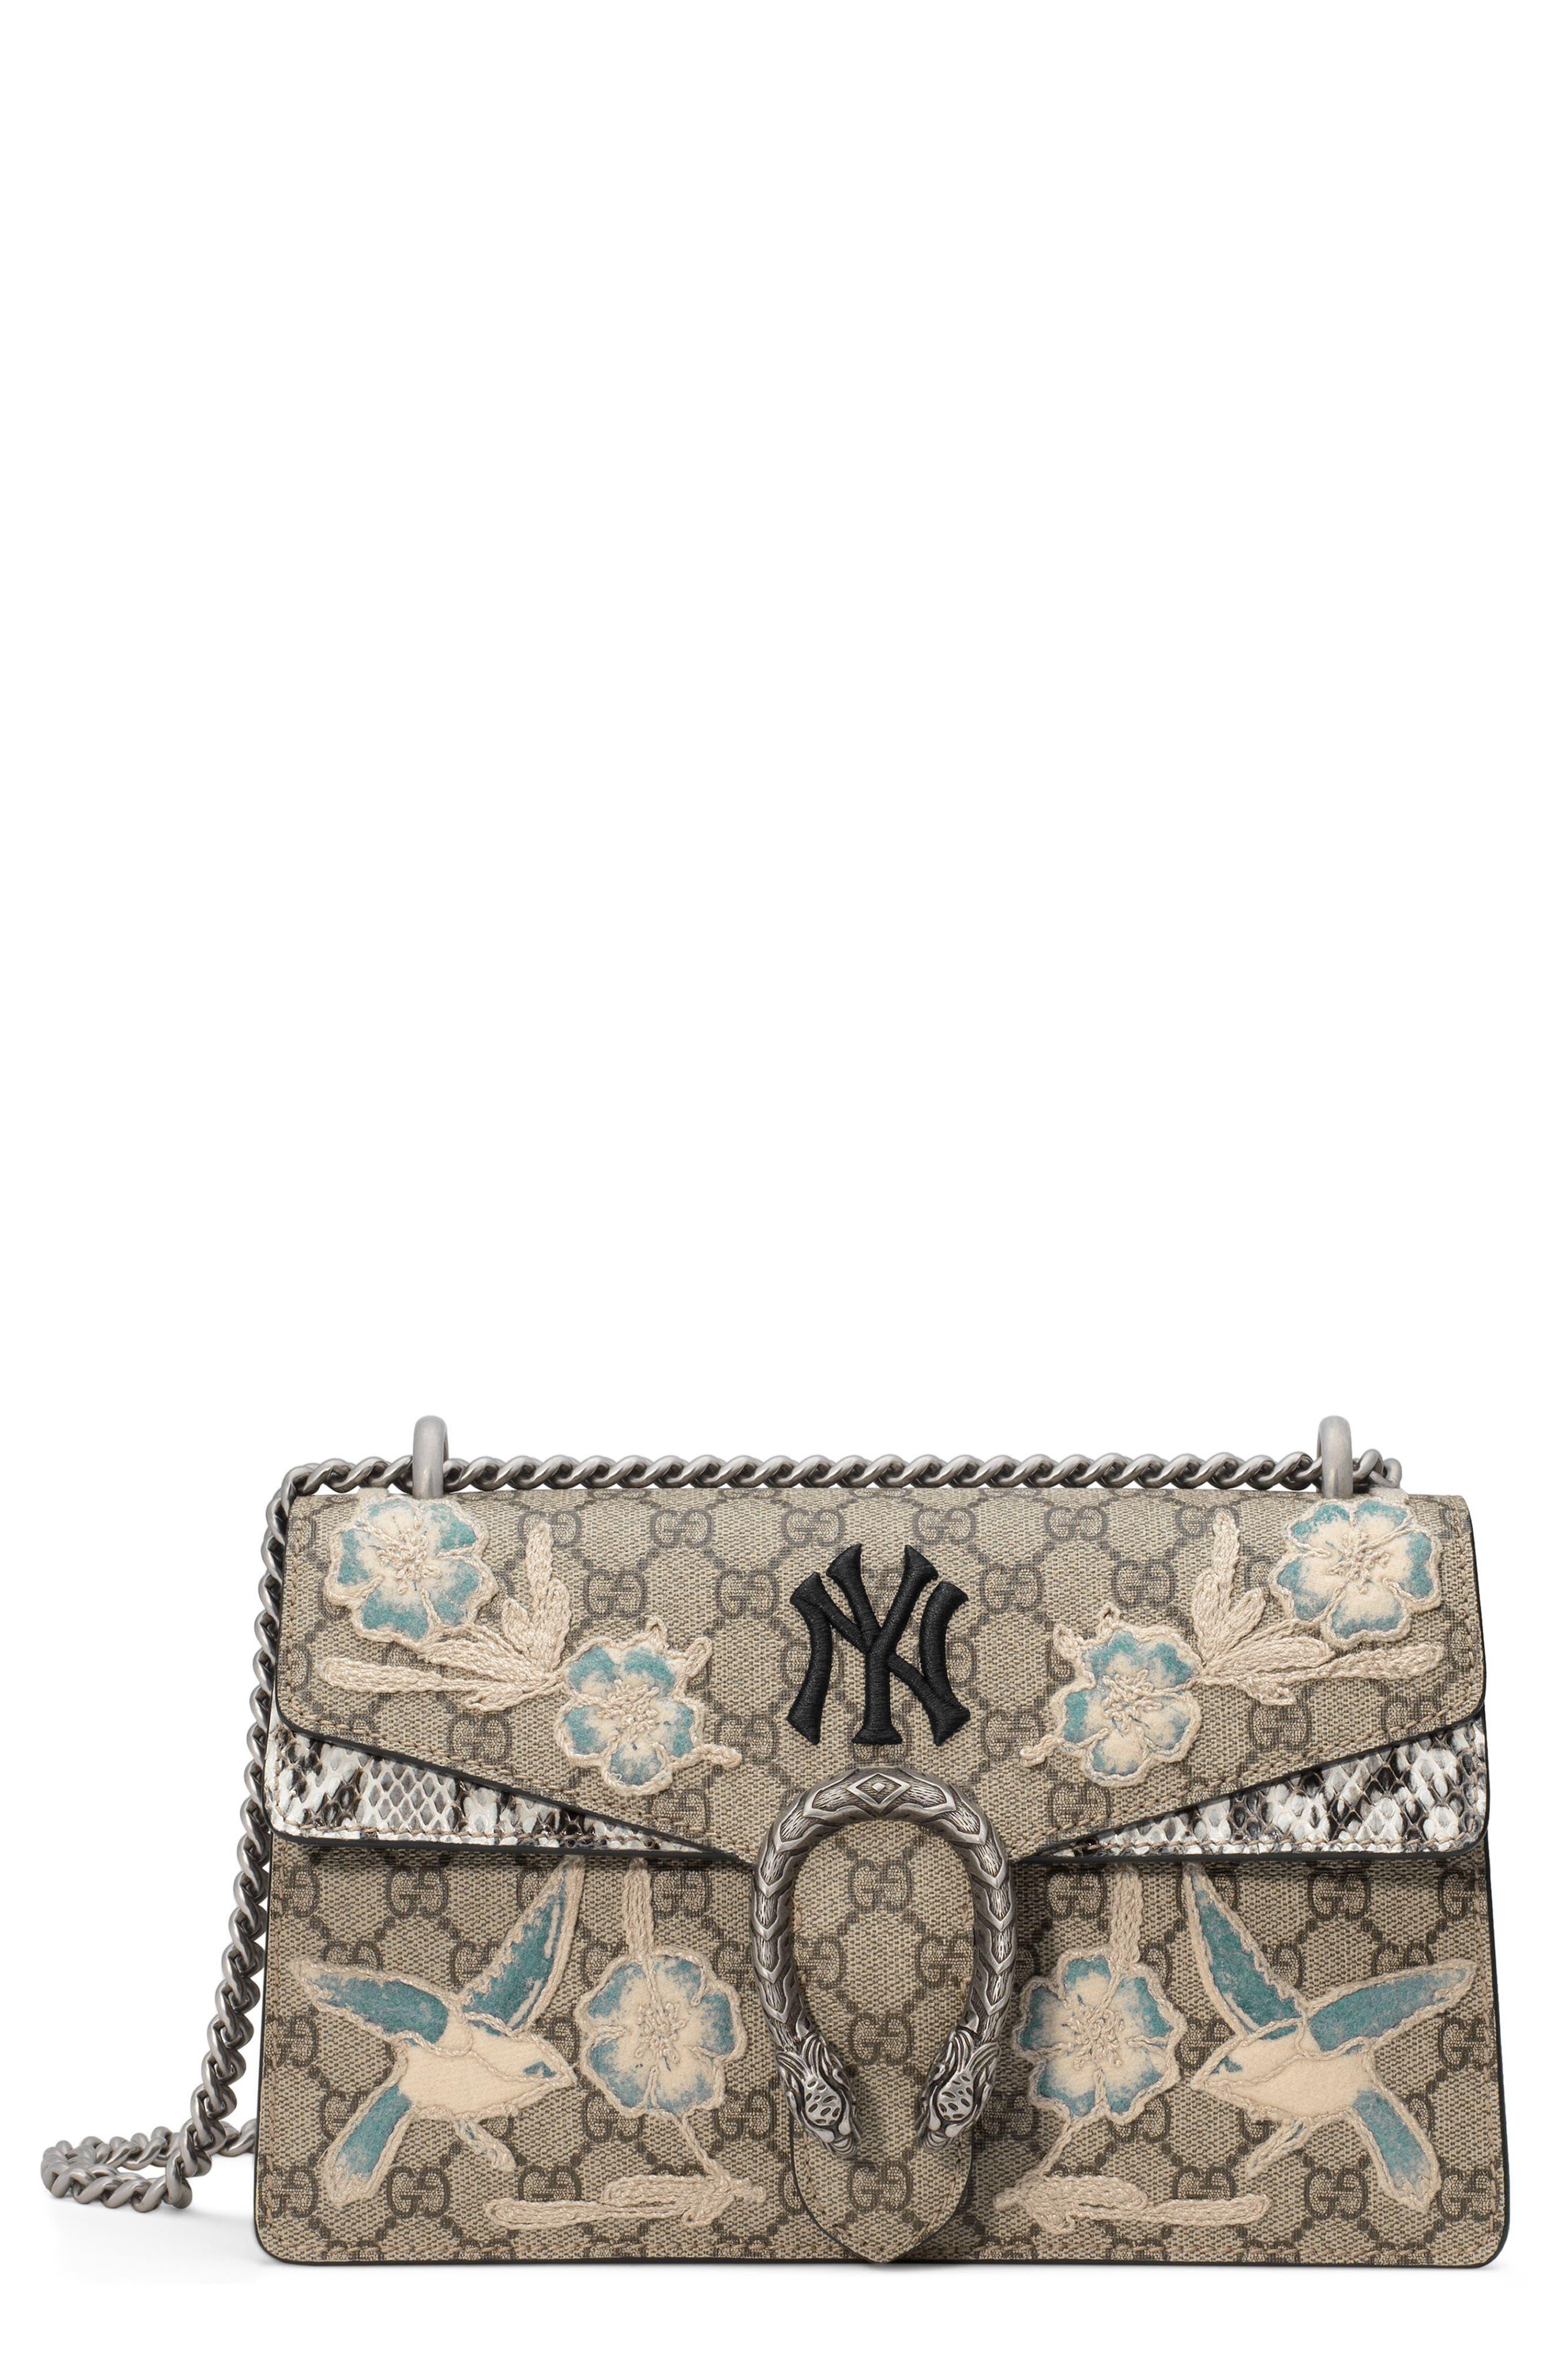 Medium Dionysus GG Supreme & Genuine Snakeskin Shoulder Bag,                             Main thumbnail 1, color,                             BEIGE EBONY/ ROCCIA MULTI